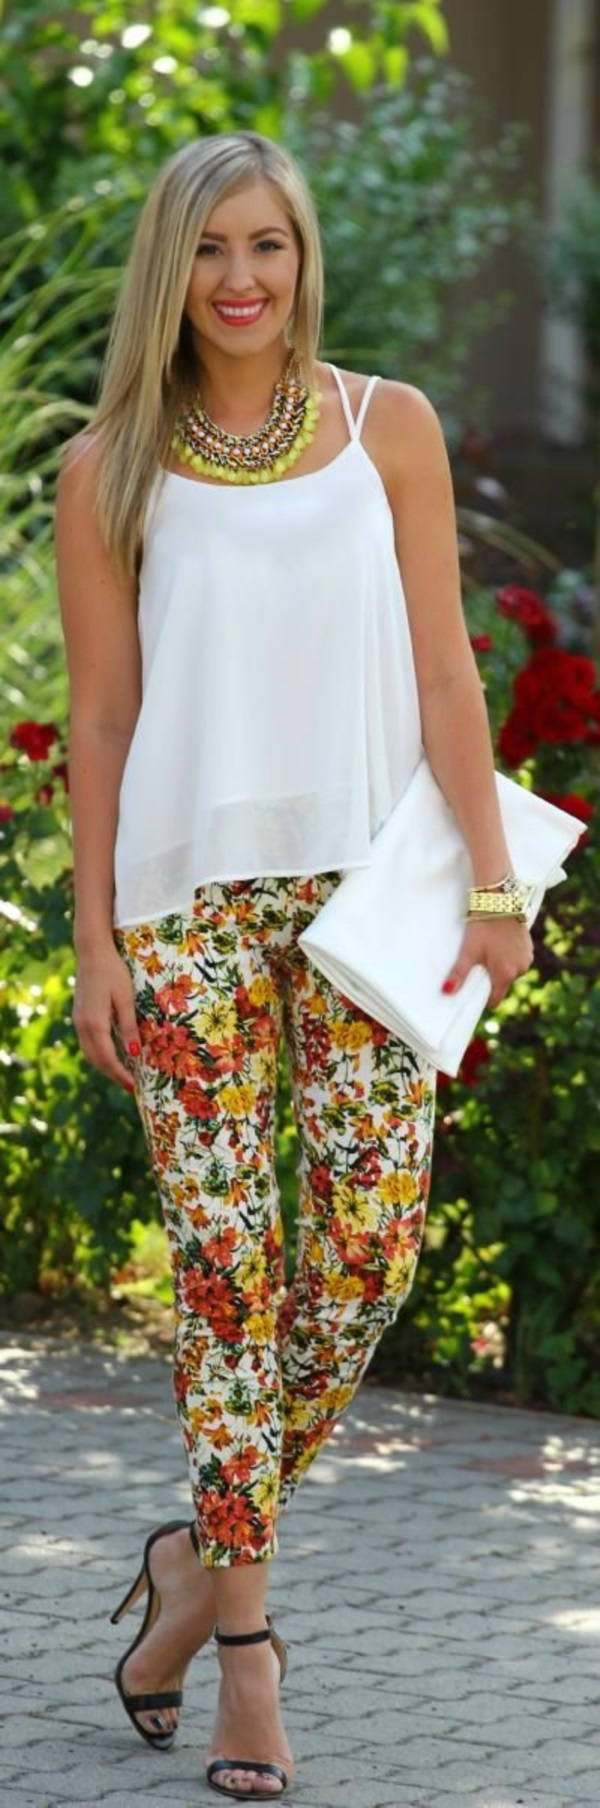 black floral pants outfits (61)